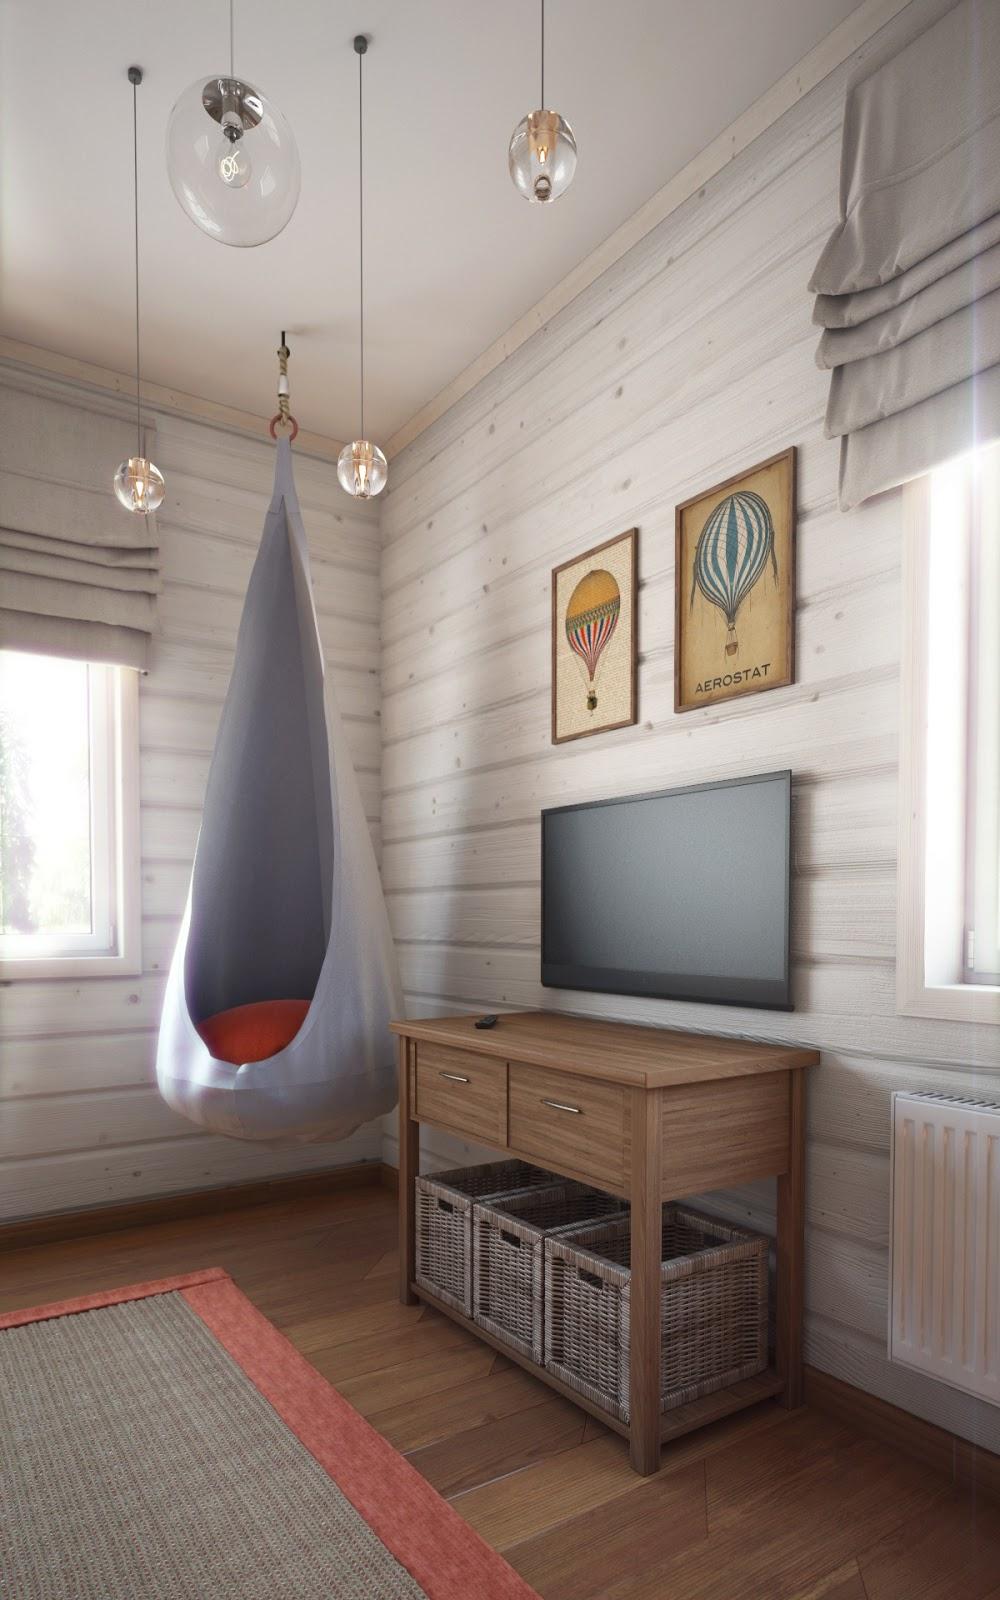 Dormitorio infantil con globo aerosttico